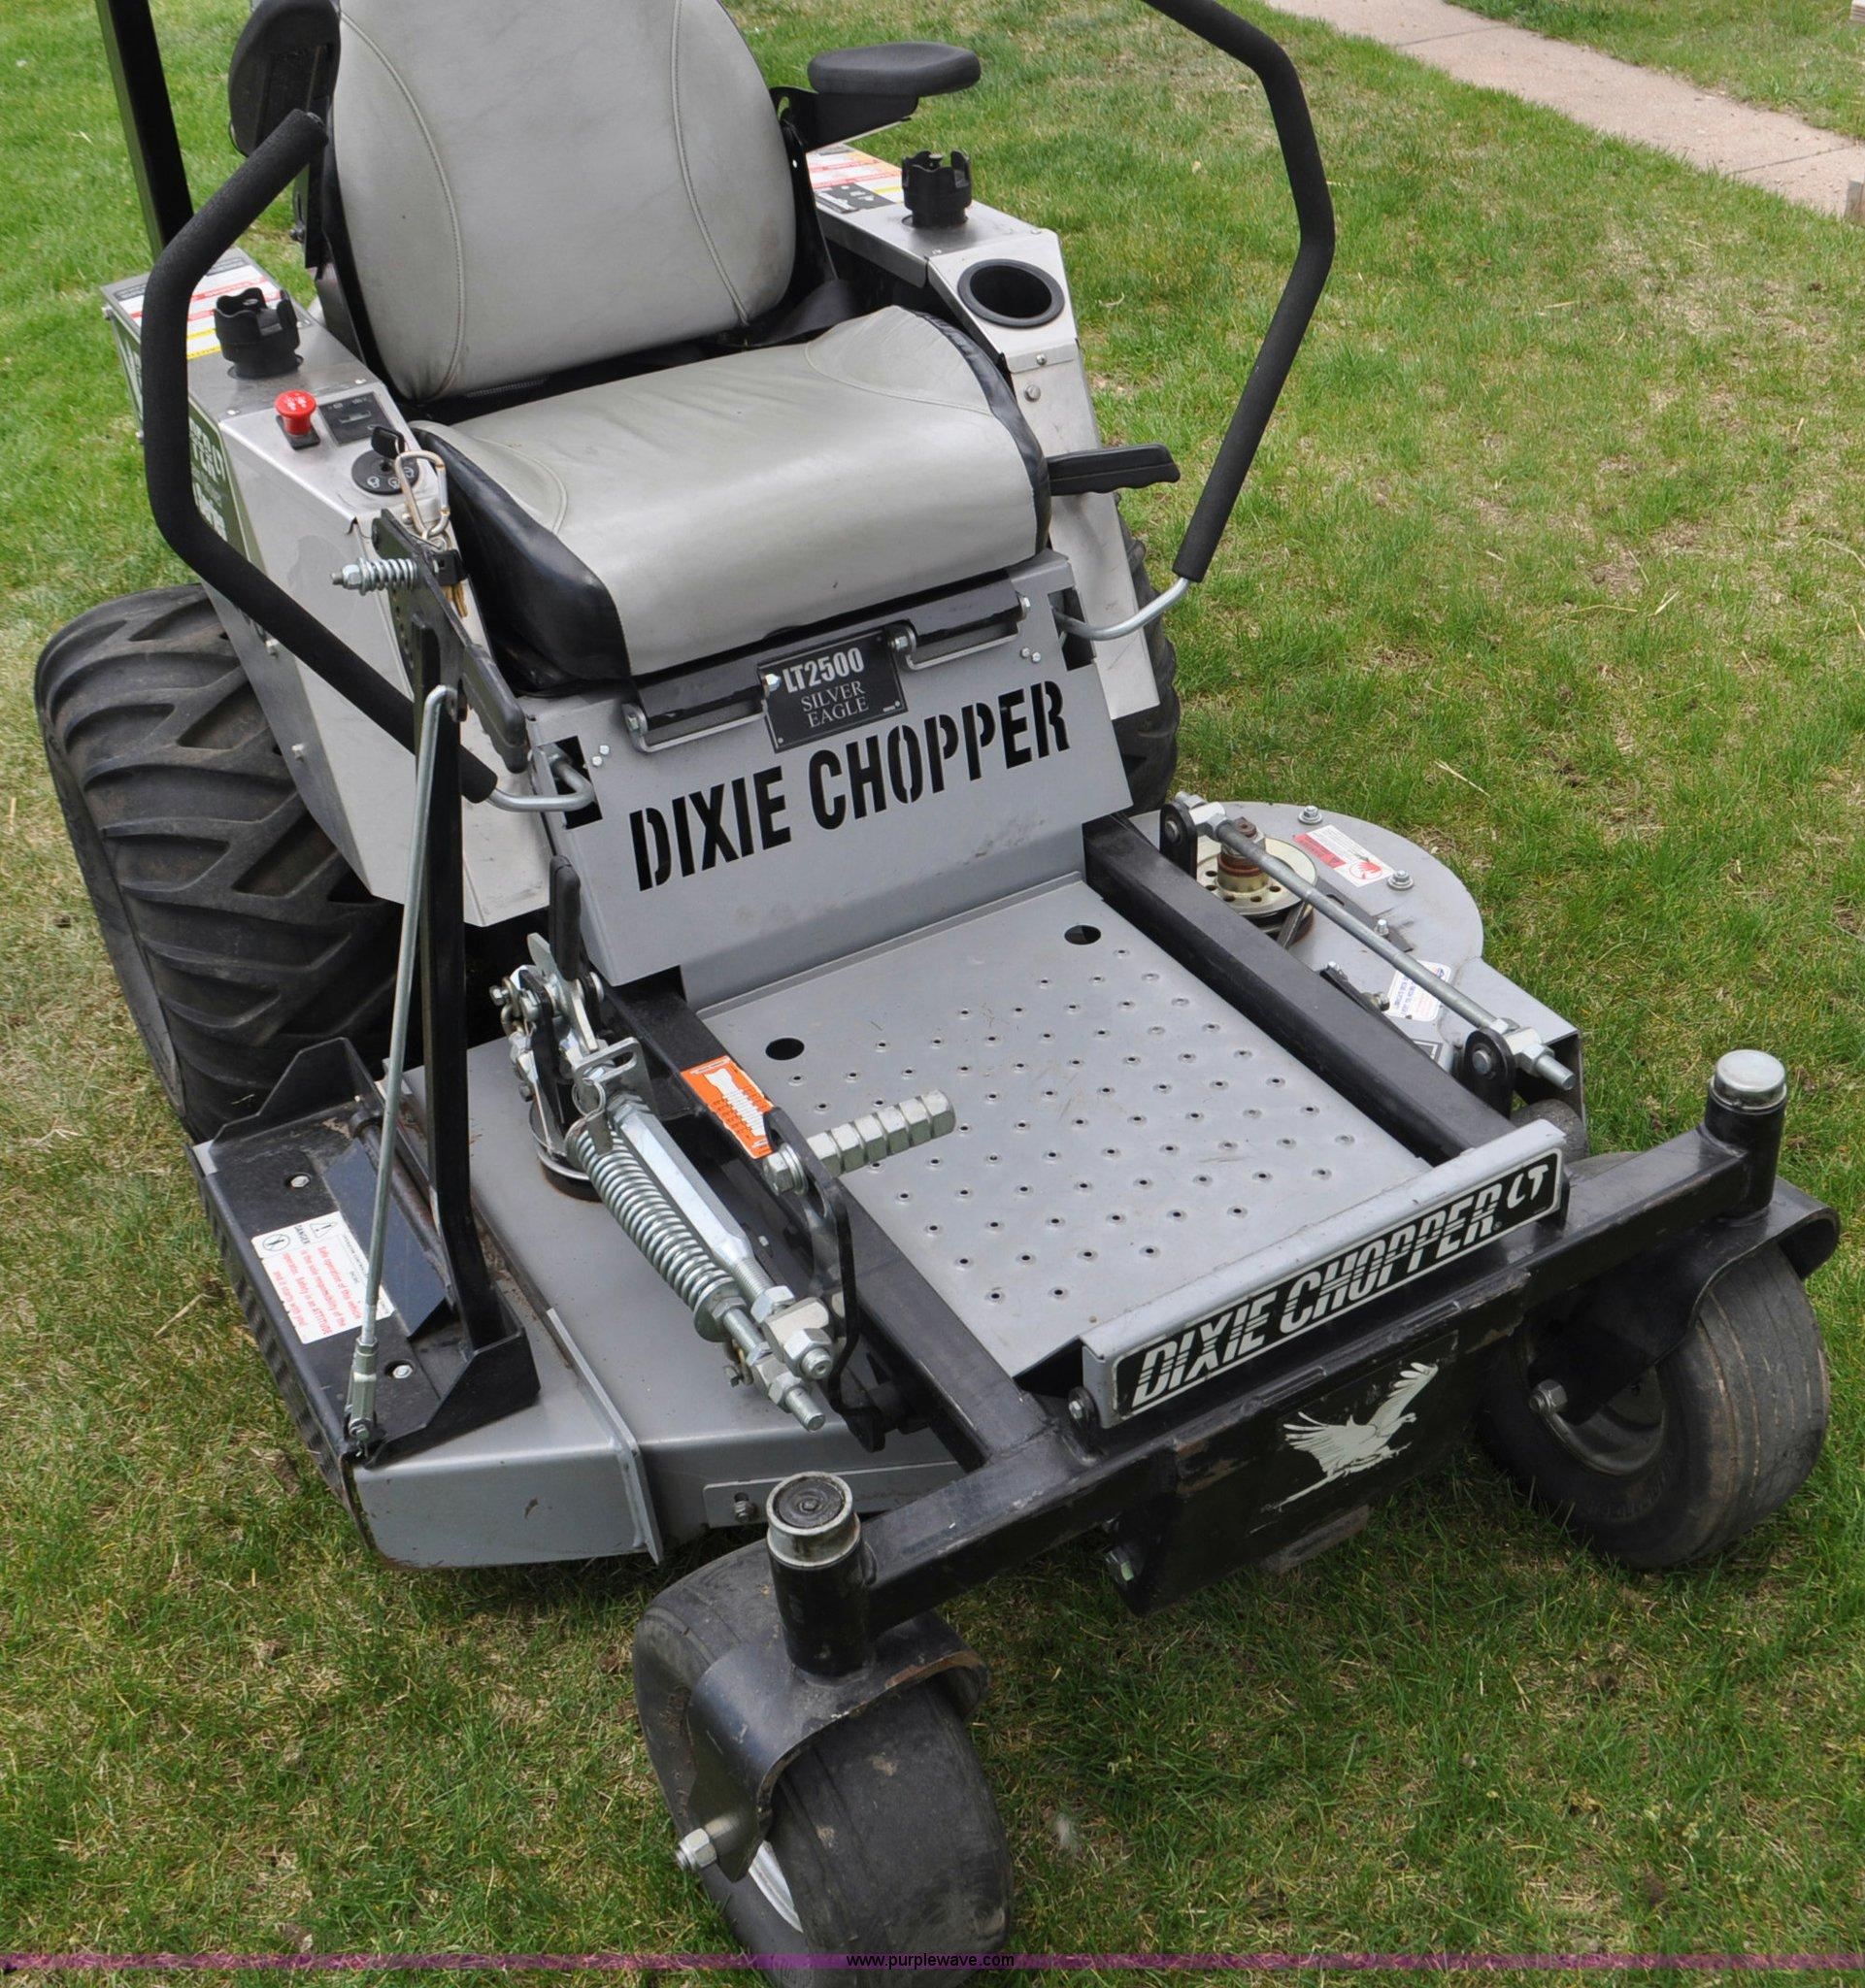 Dixie Chopper LT2700 ZTR lawn mower | Item G6472 | SOLD! May